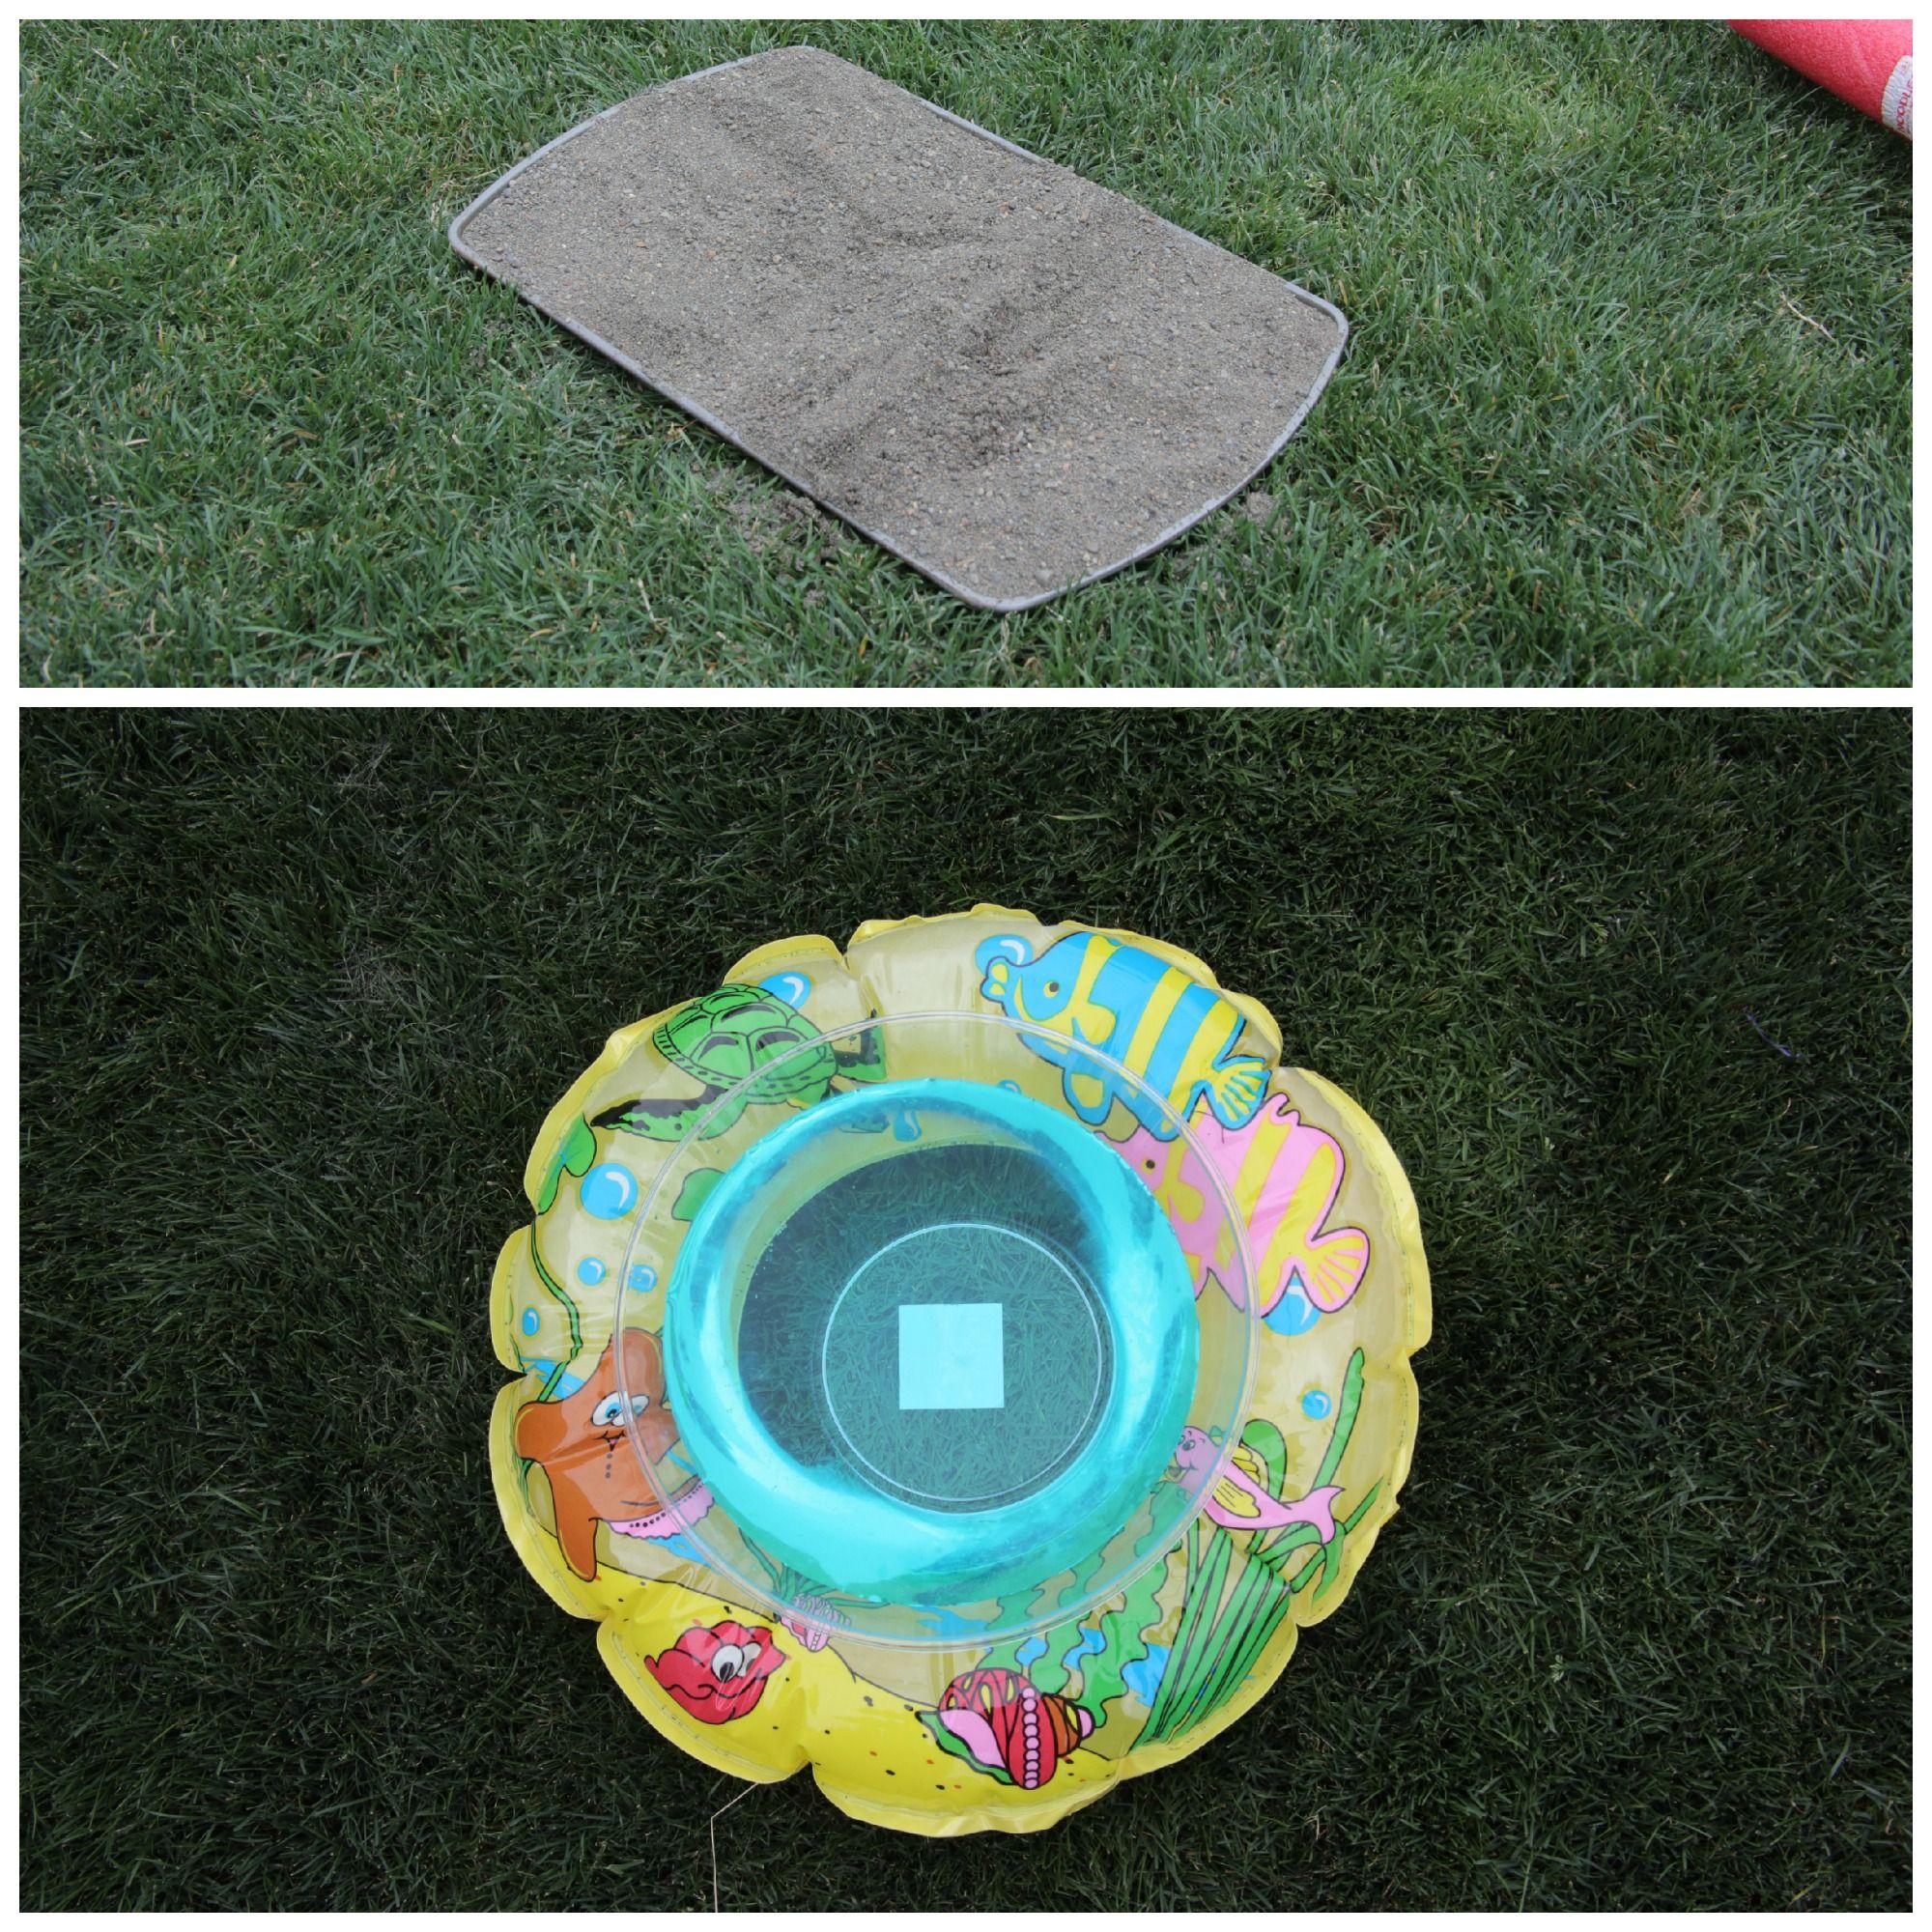 DIY Mini Golf Course - sand trap and water hazard!